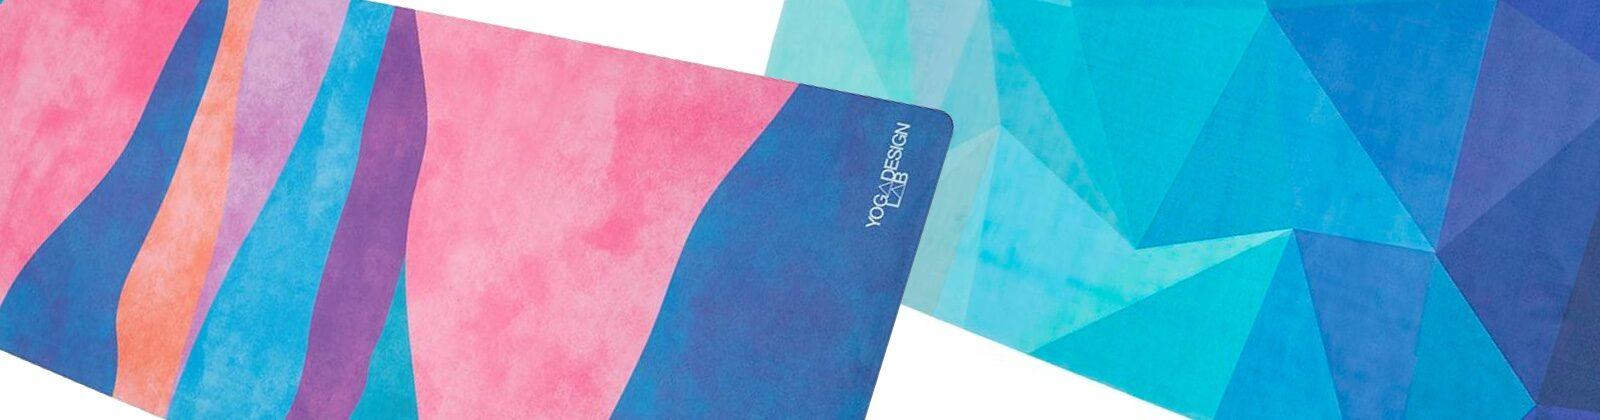 colorful yoga design lab yoga mats